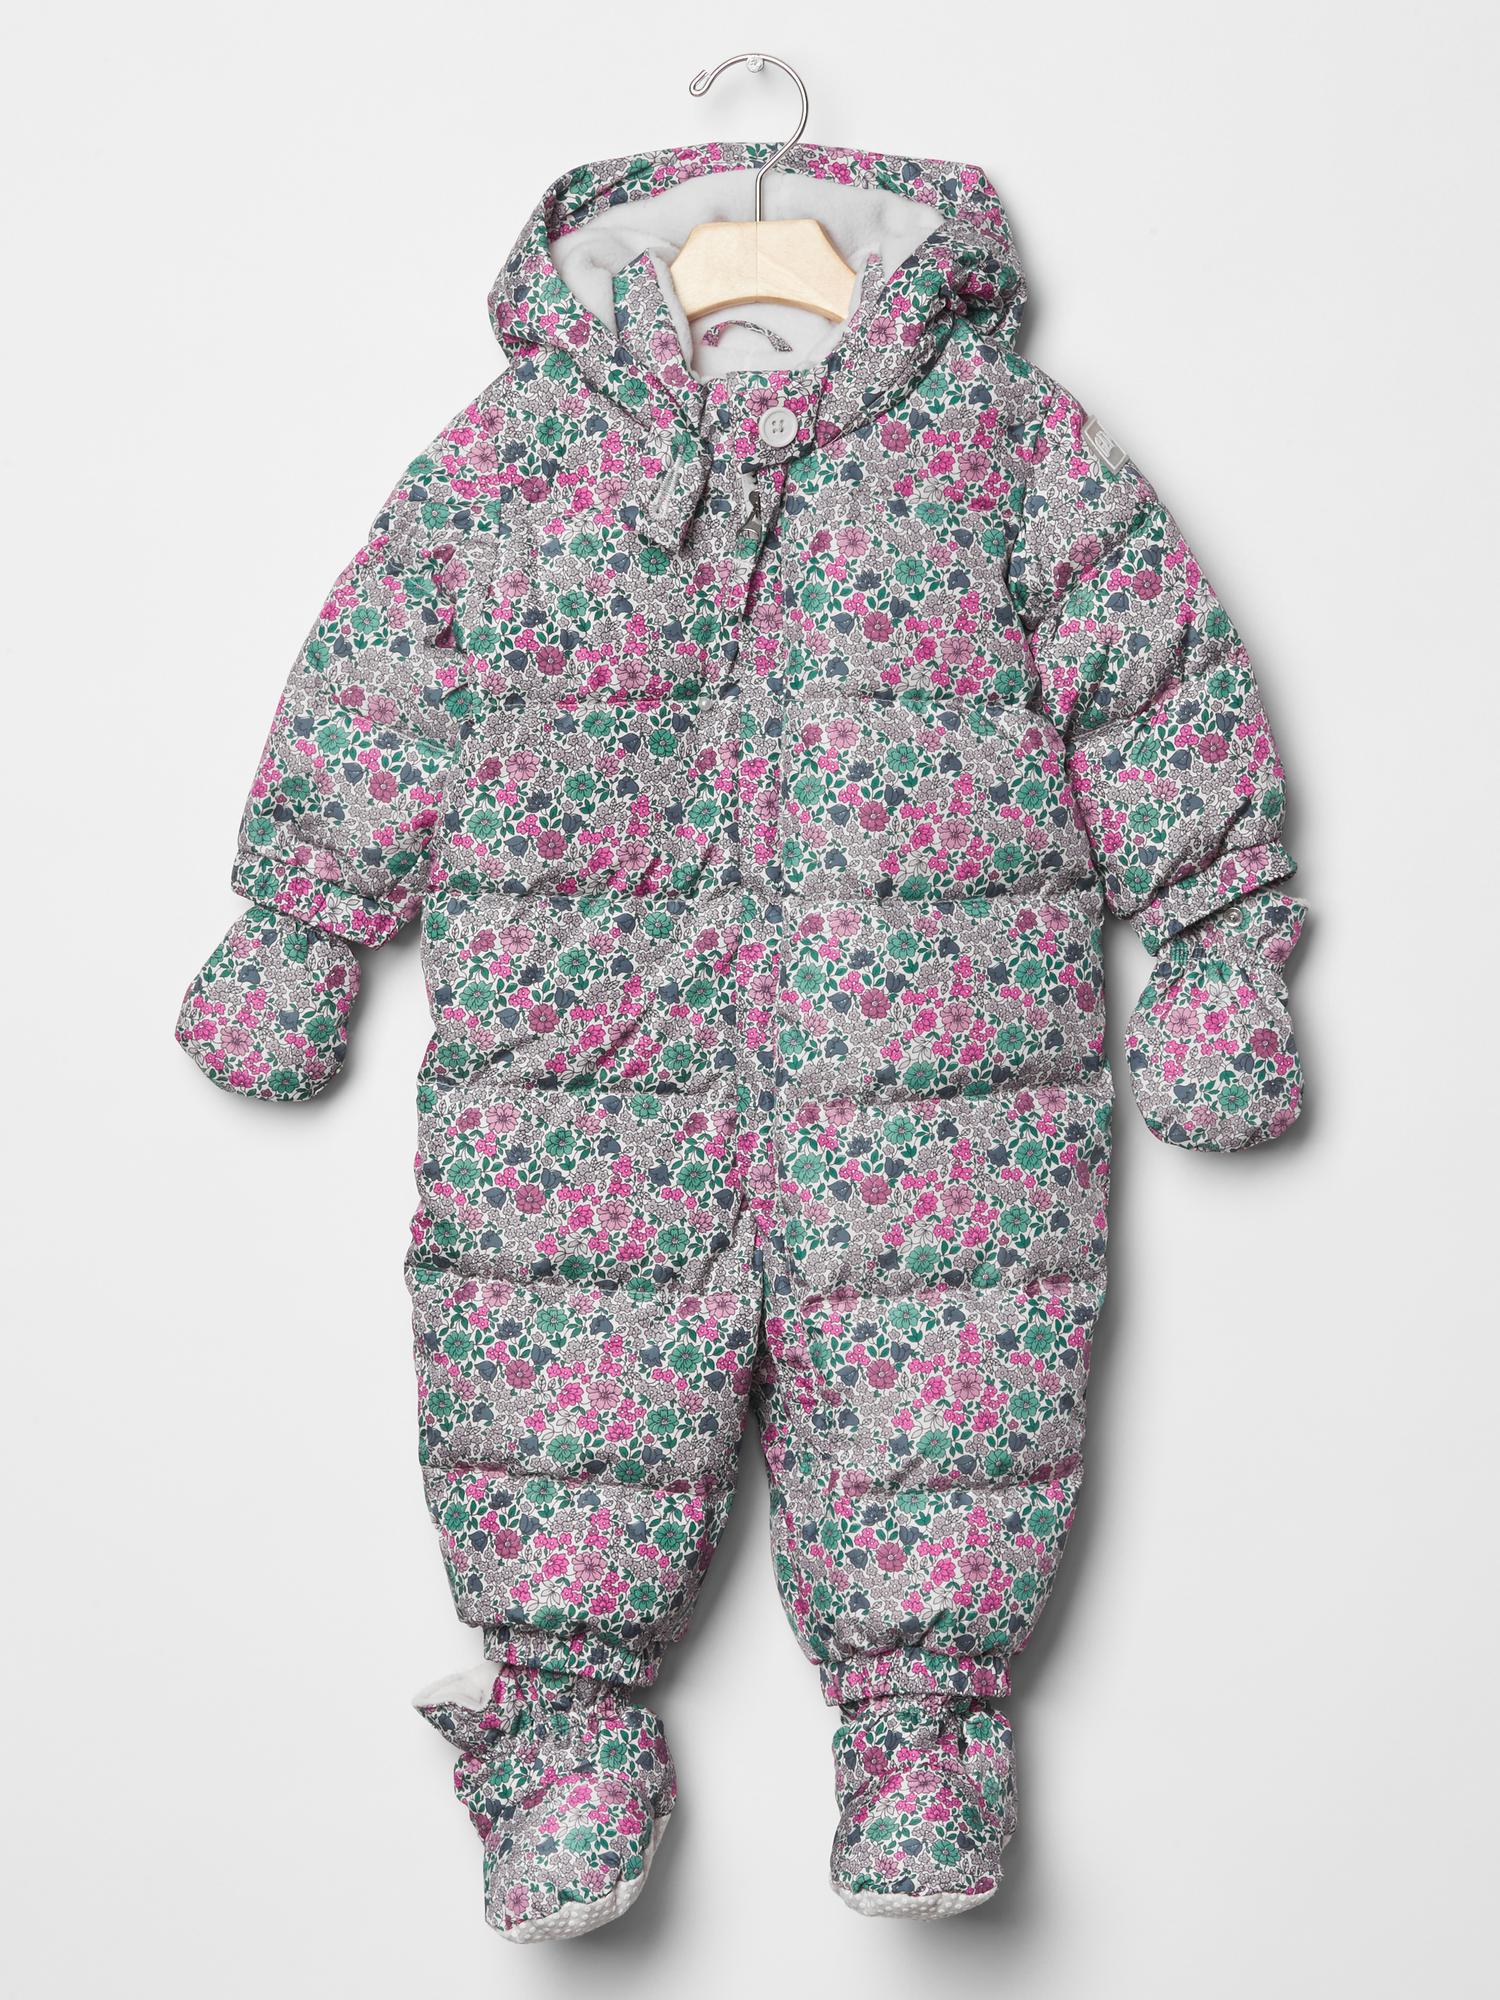 Warmest Down Snowsuit from Baby Gap